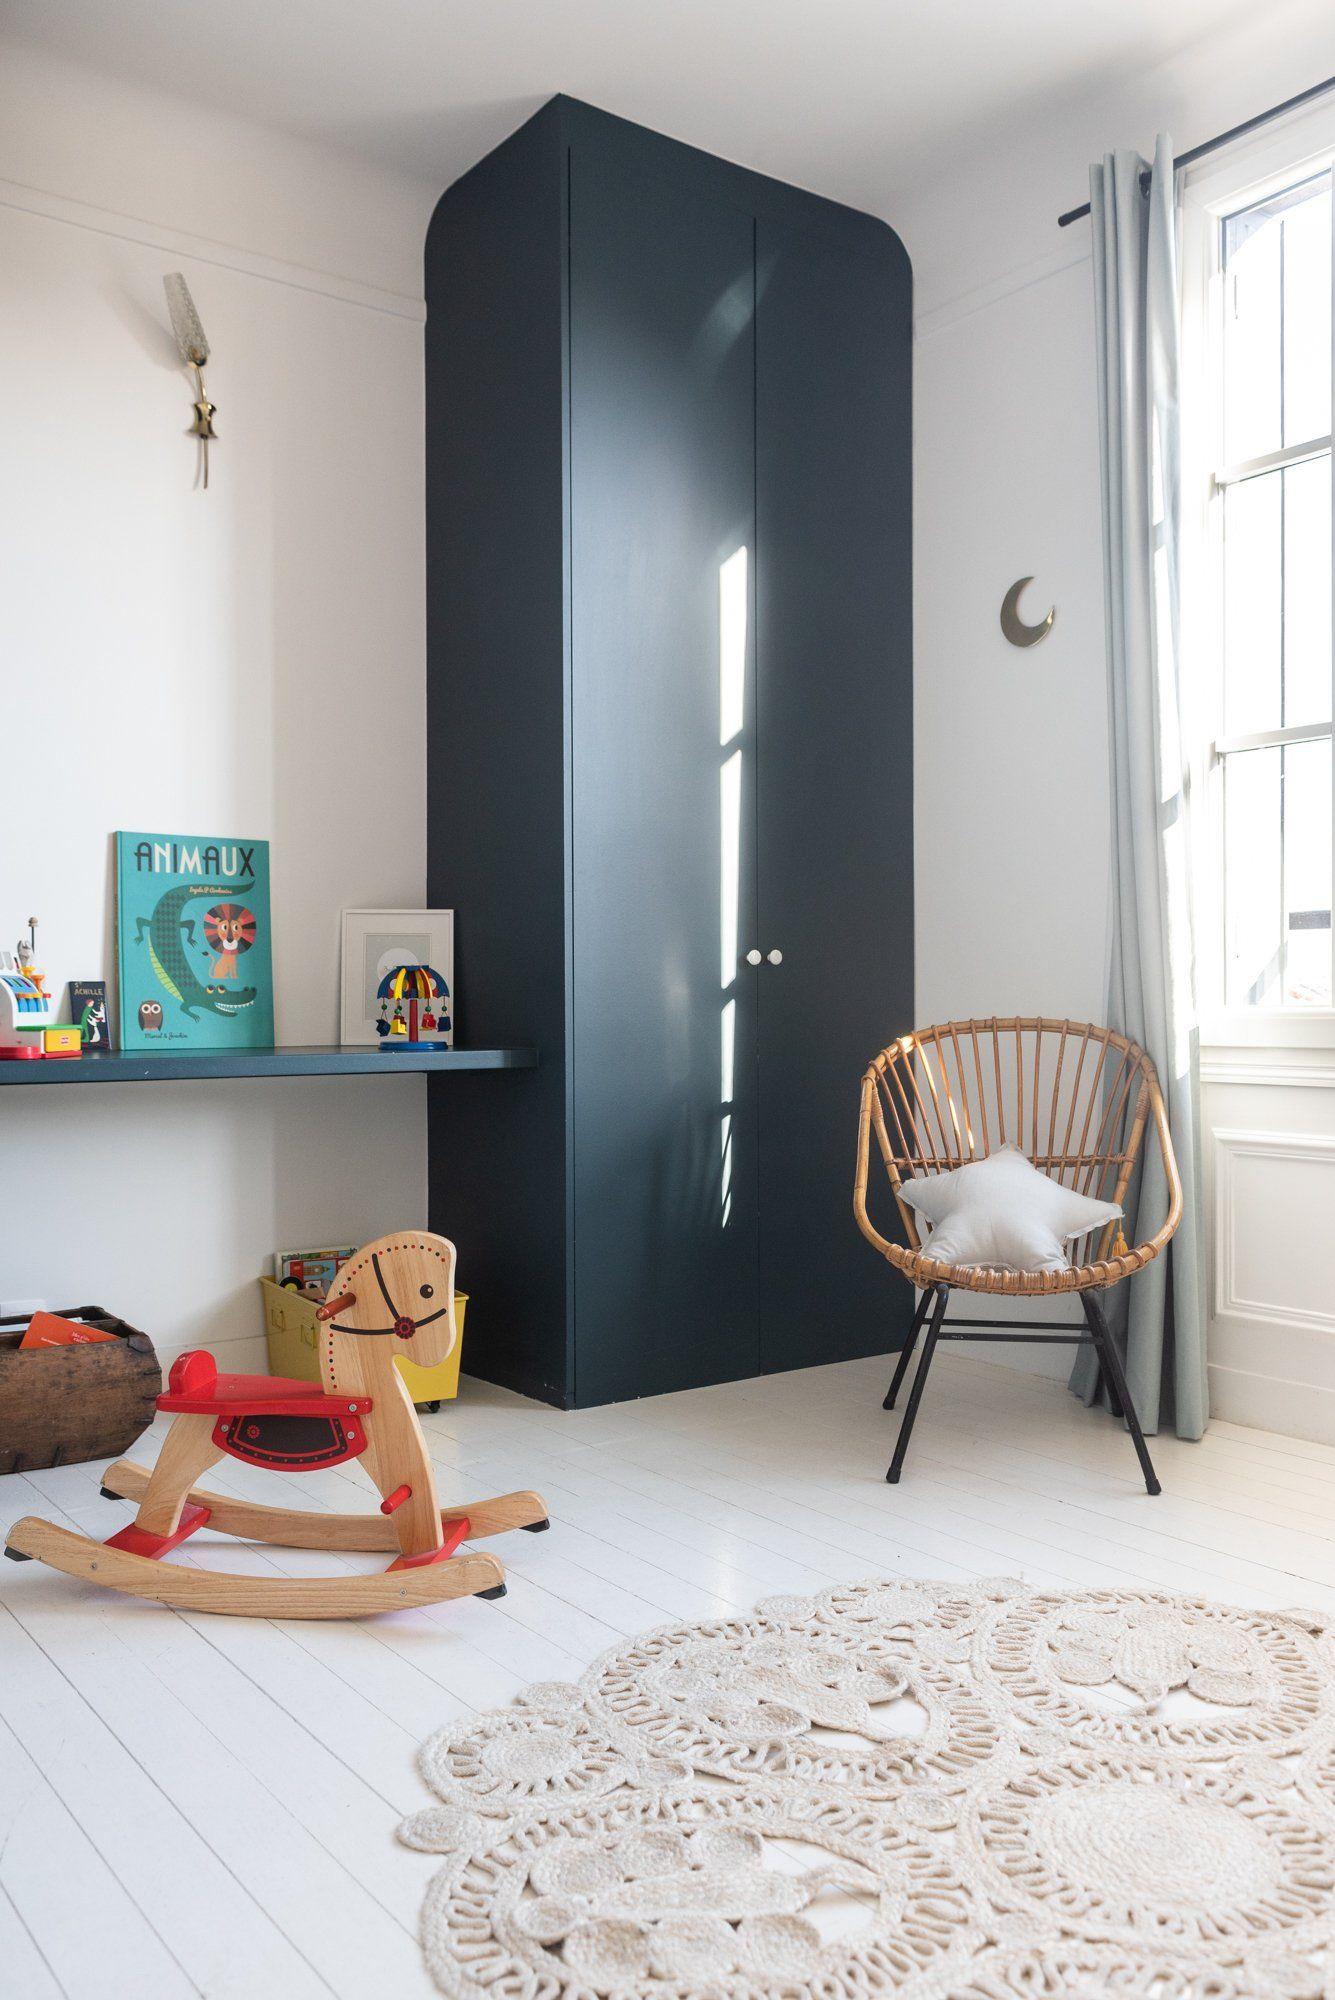 myl ne kiener arthus 6 jeanne 4 ans et achille 18 mois. Black Bedroom Furniture Sets. Home Design Ideas